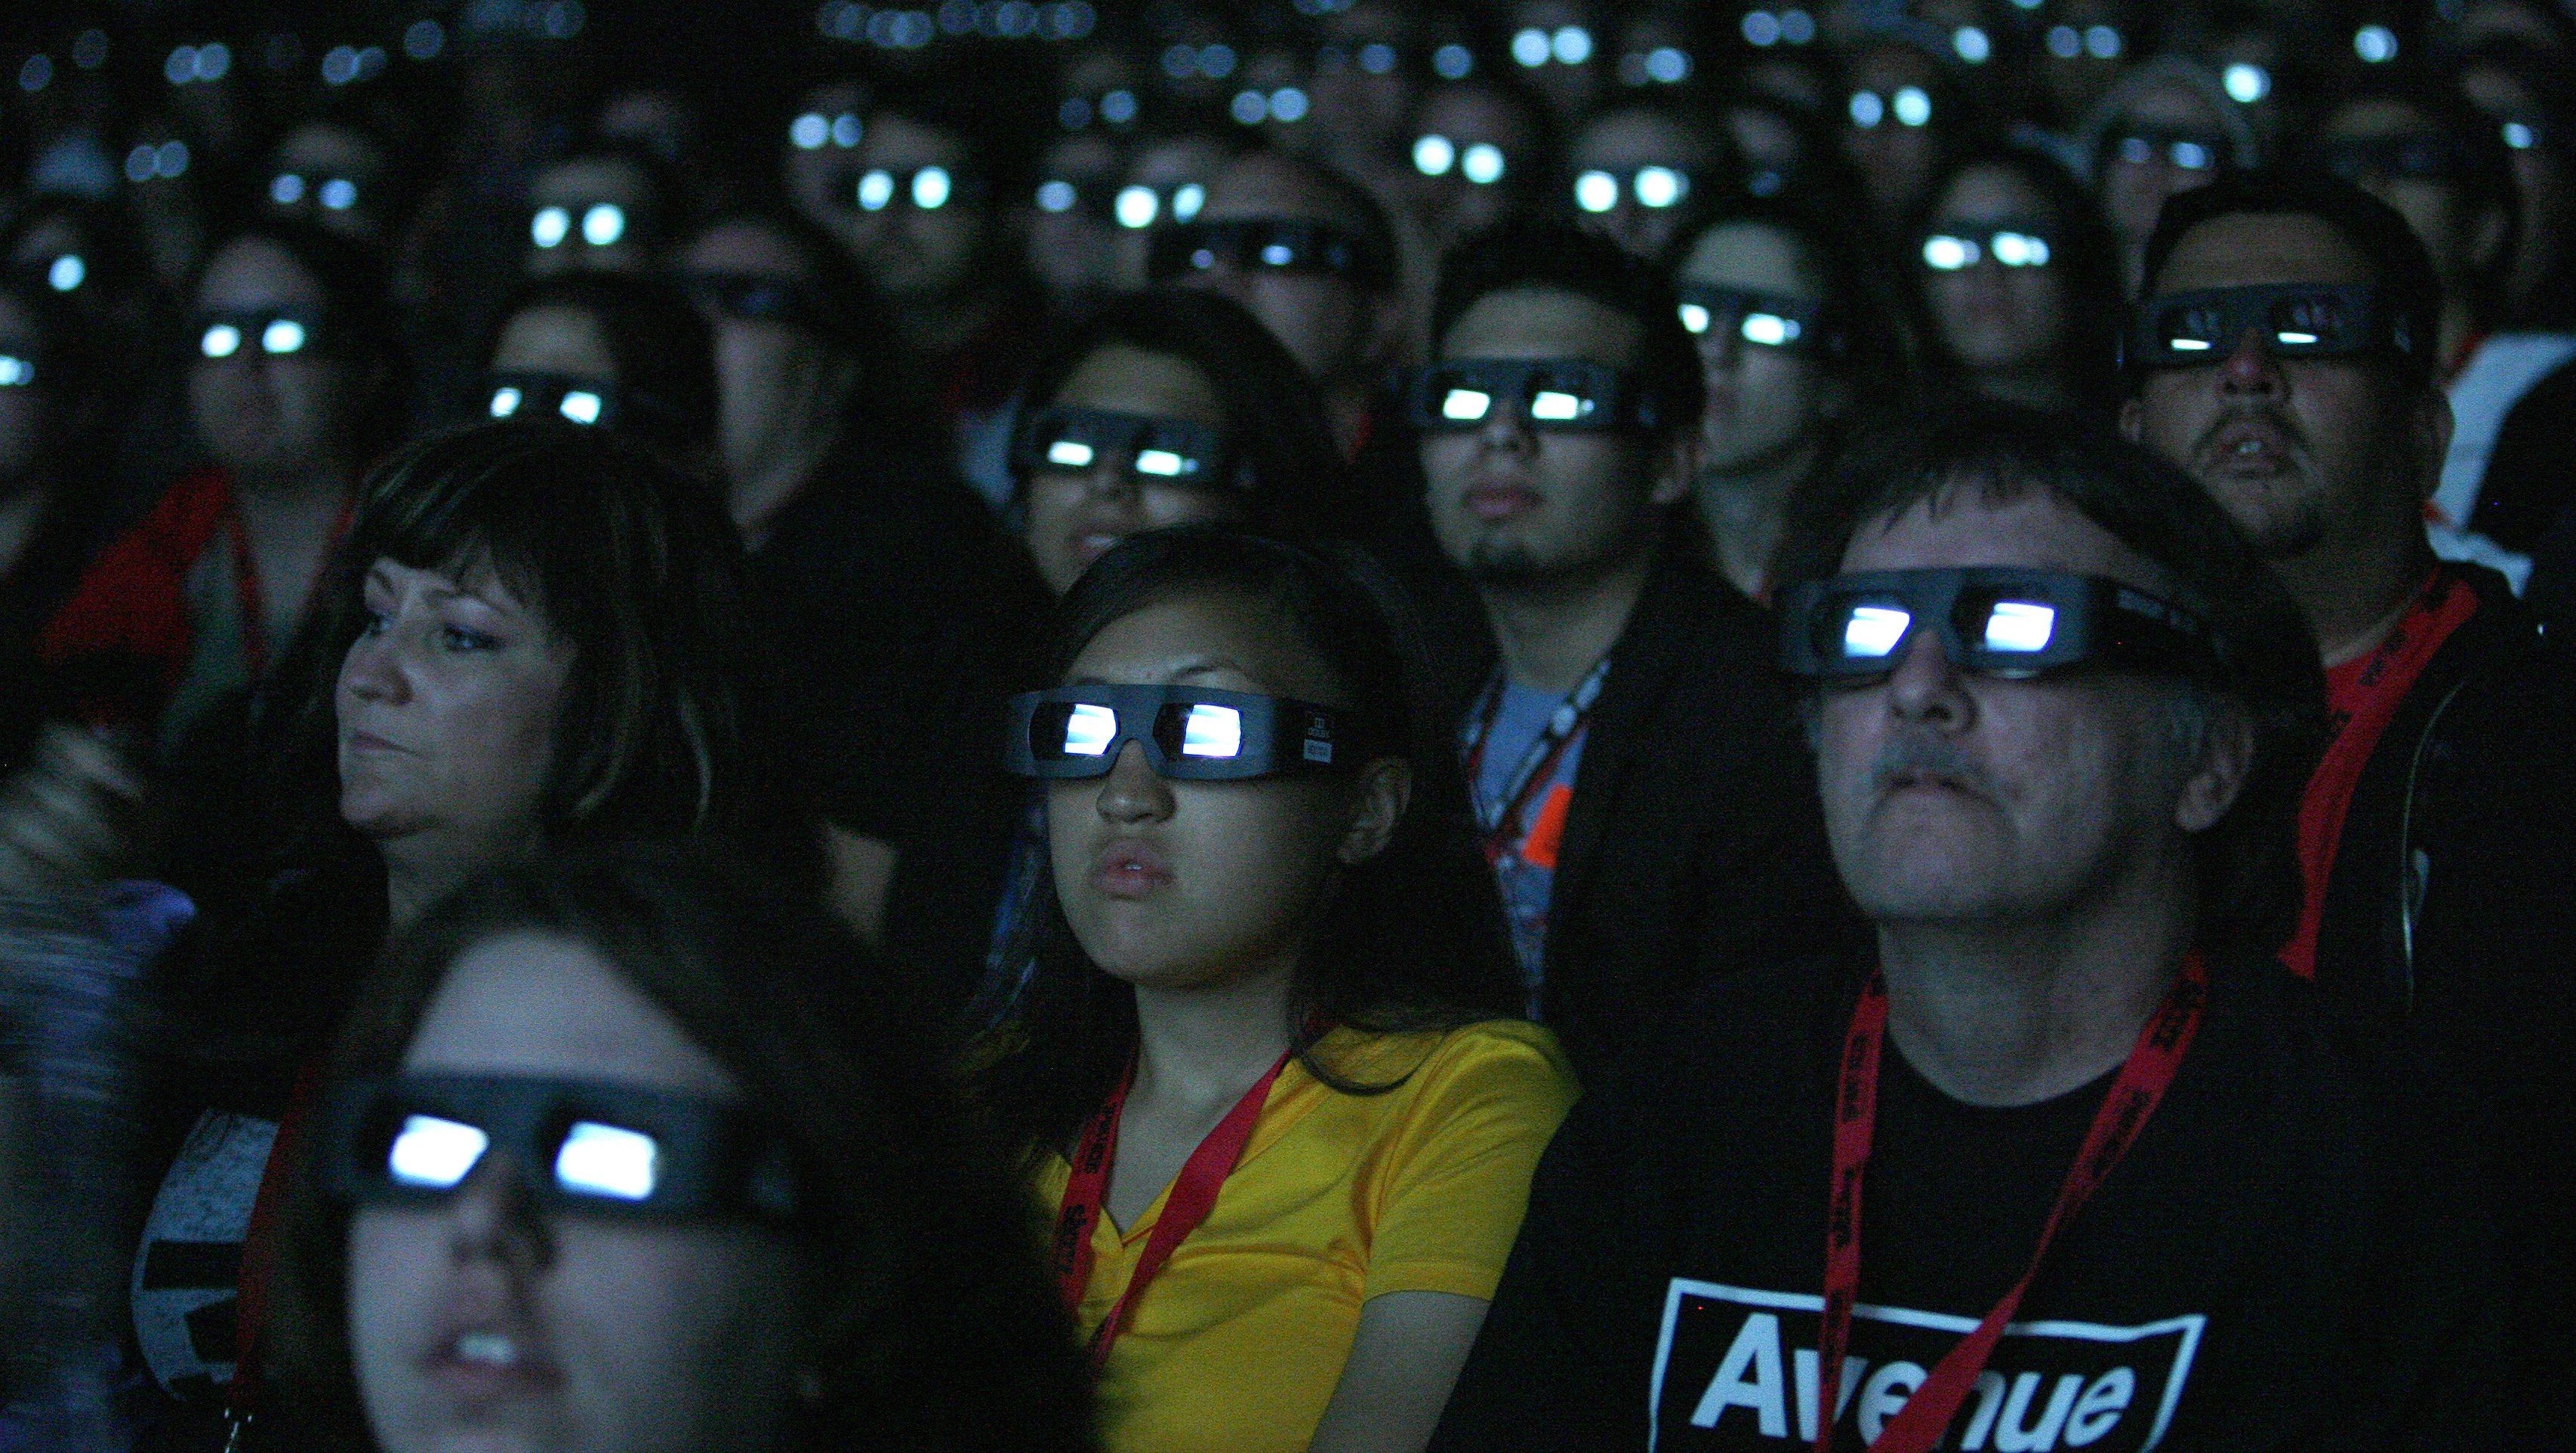 3D glasses movie